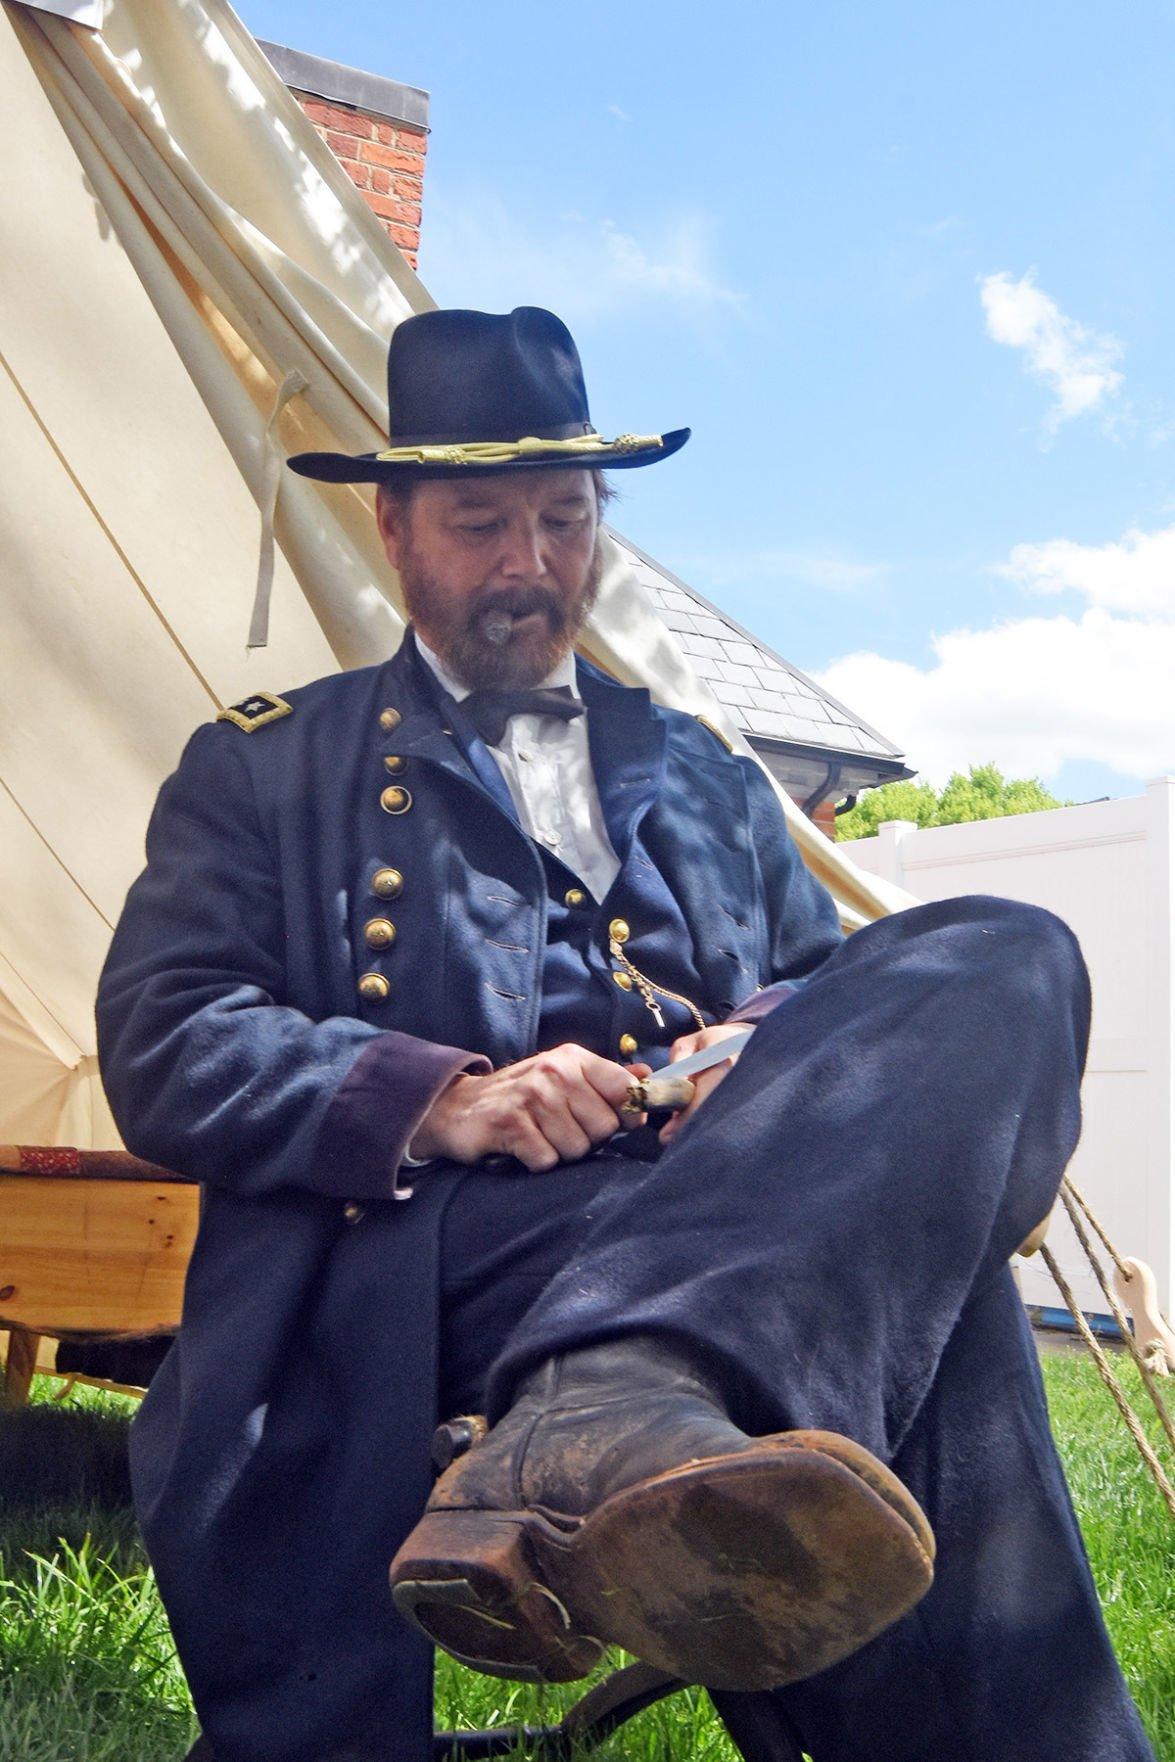 Grant Costume Union General Ulysses S